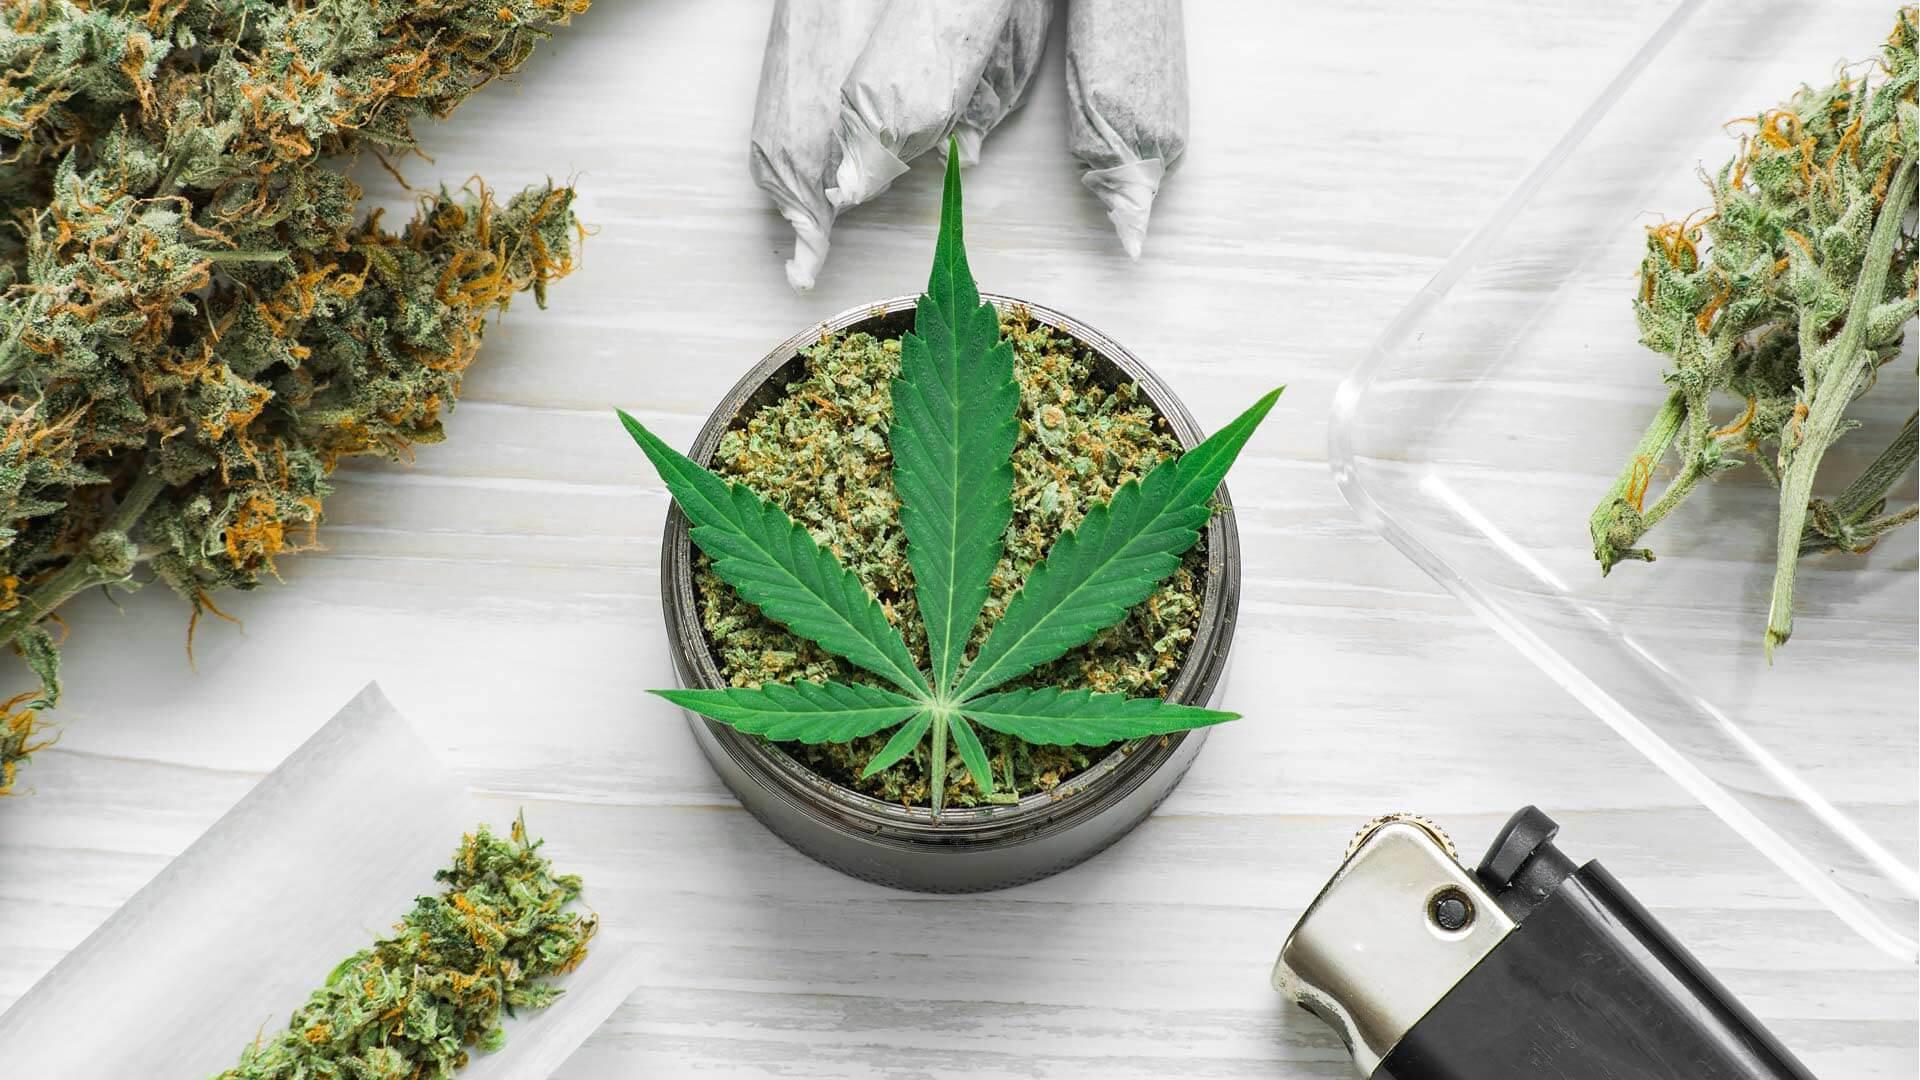 The Influence of Cannabis on Social Media